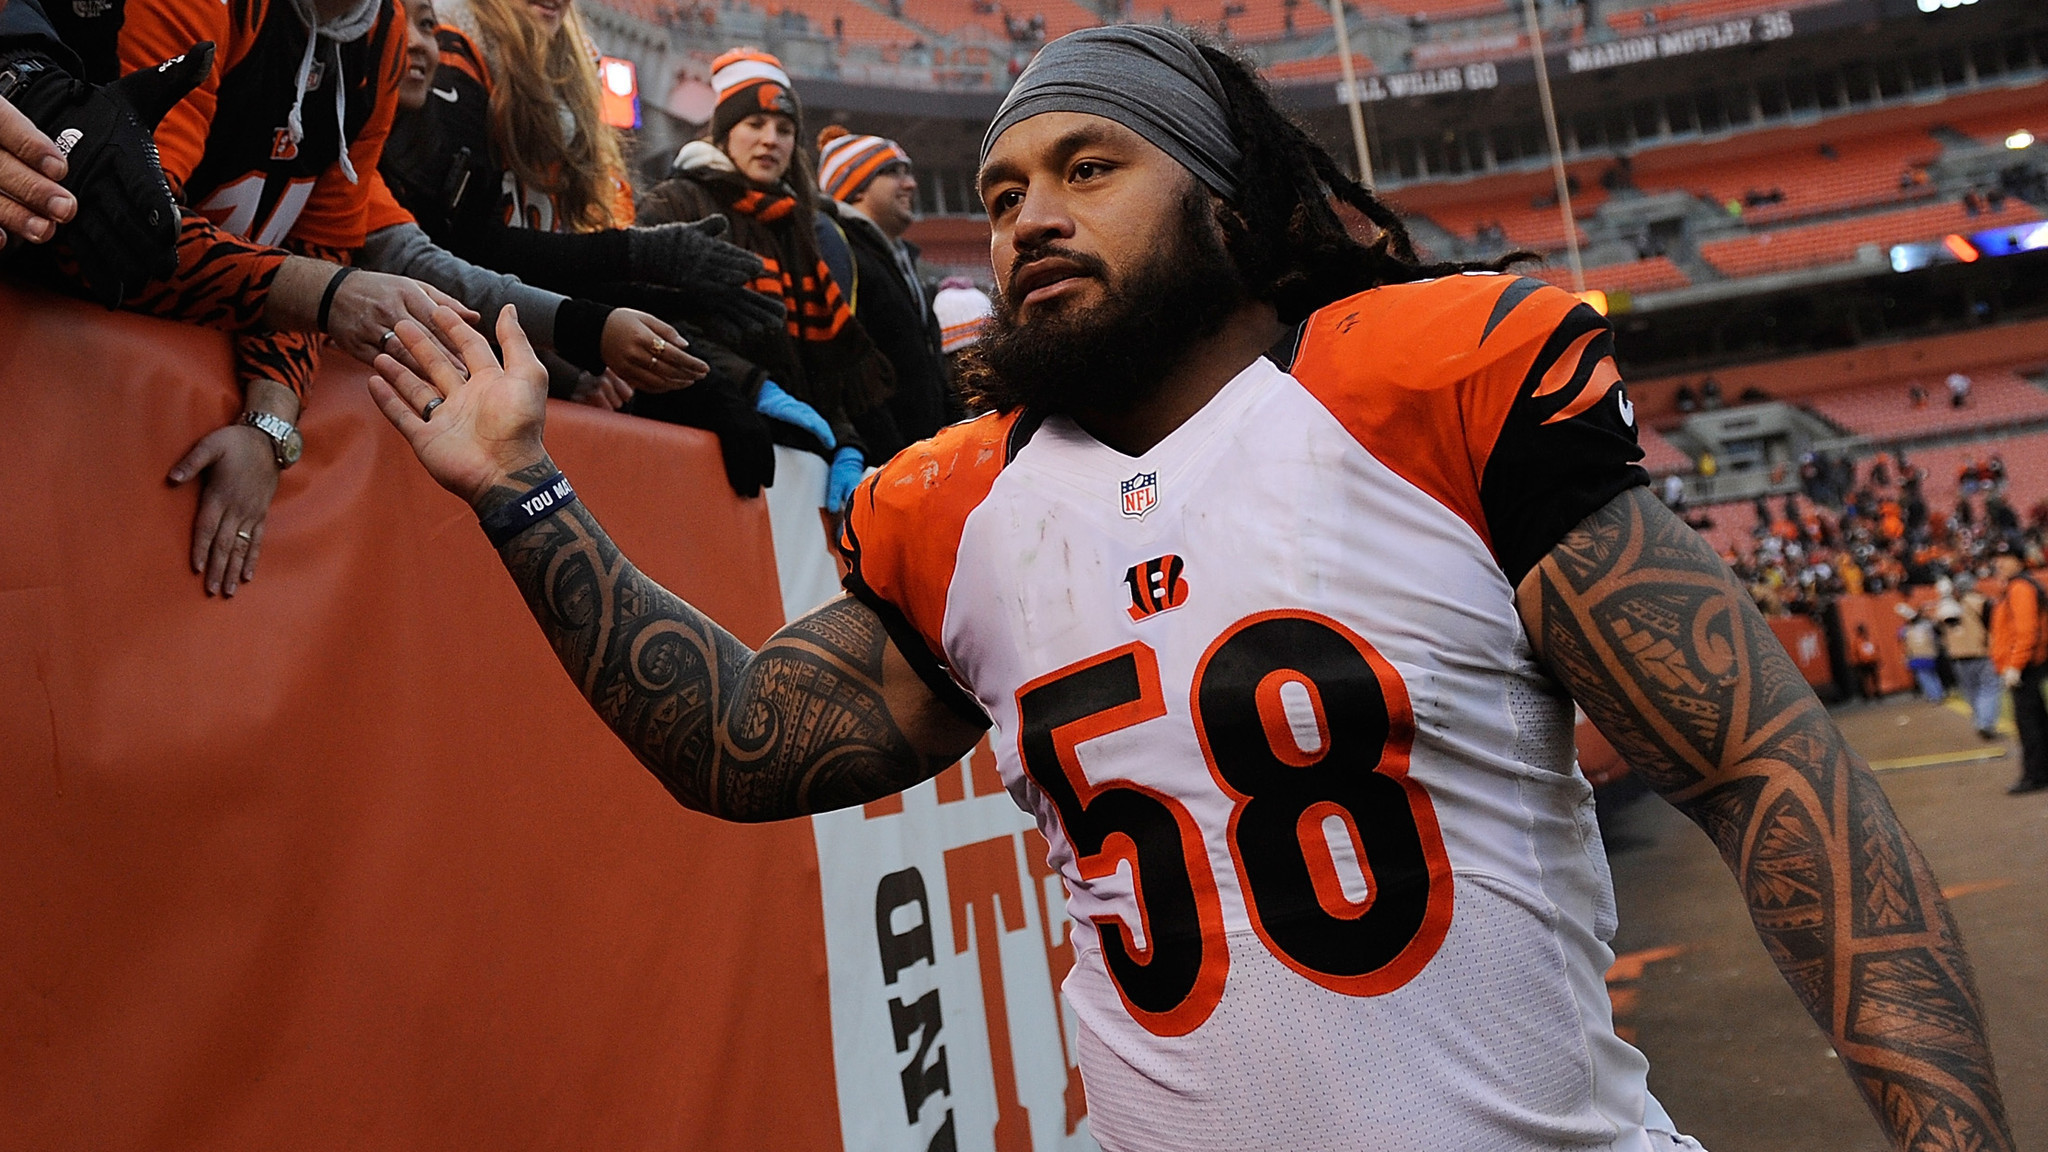 NFL report: Bengals release veteran linebacker and captain Rey Maualuga